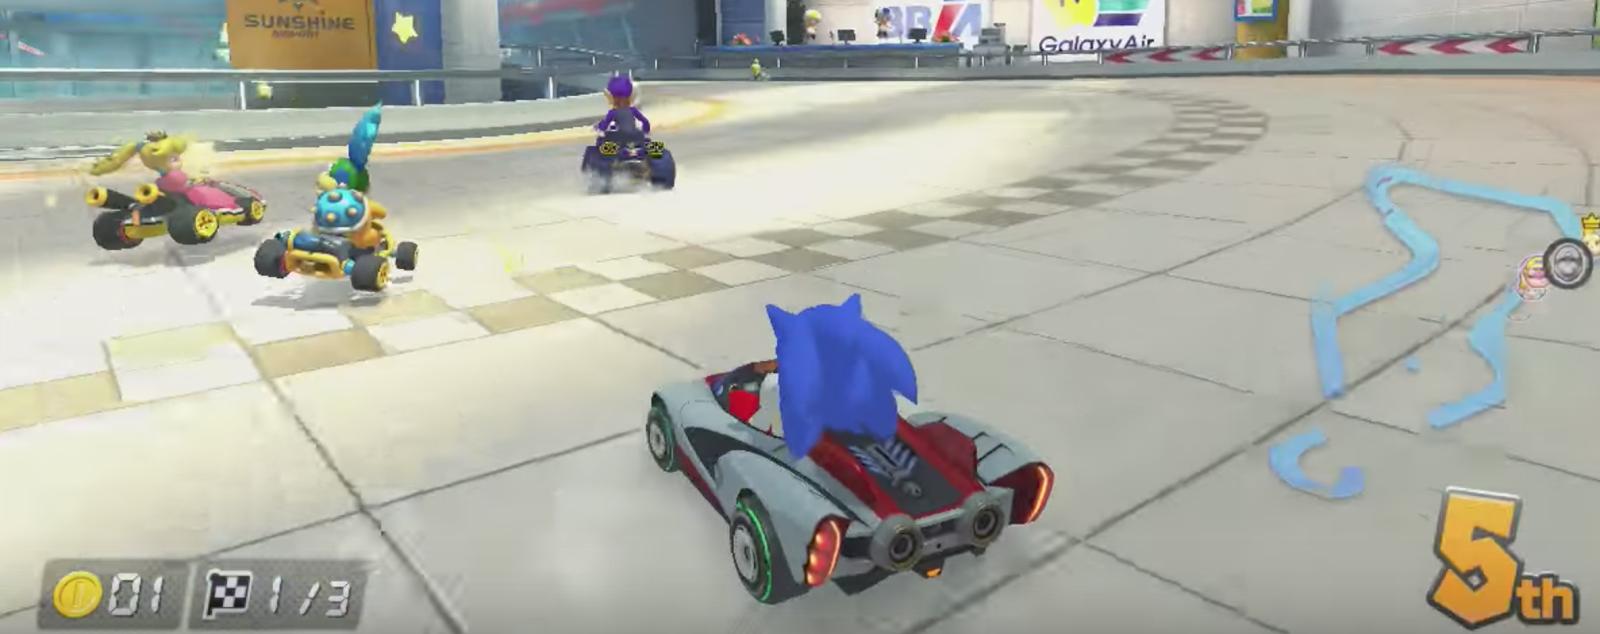 Implementan a Sonic en Mario Kart 8